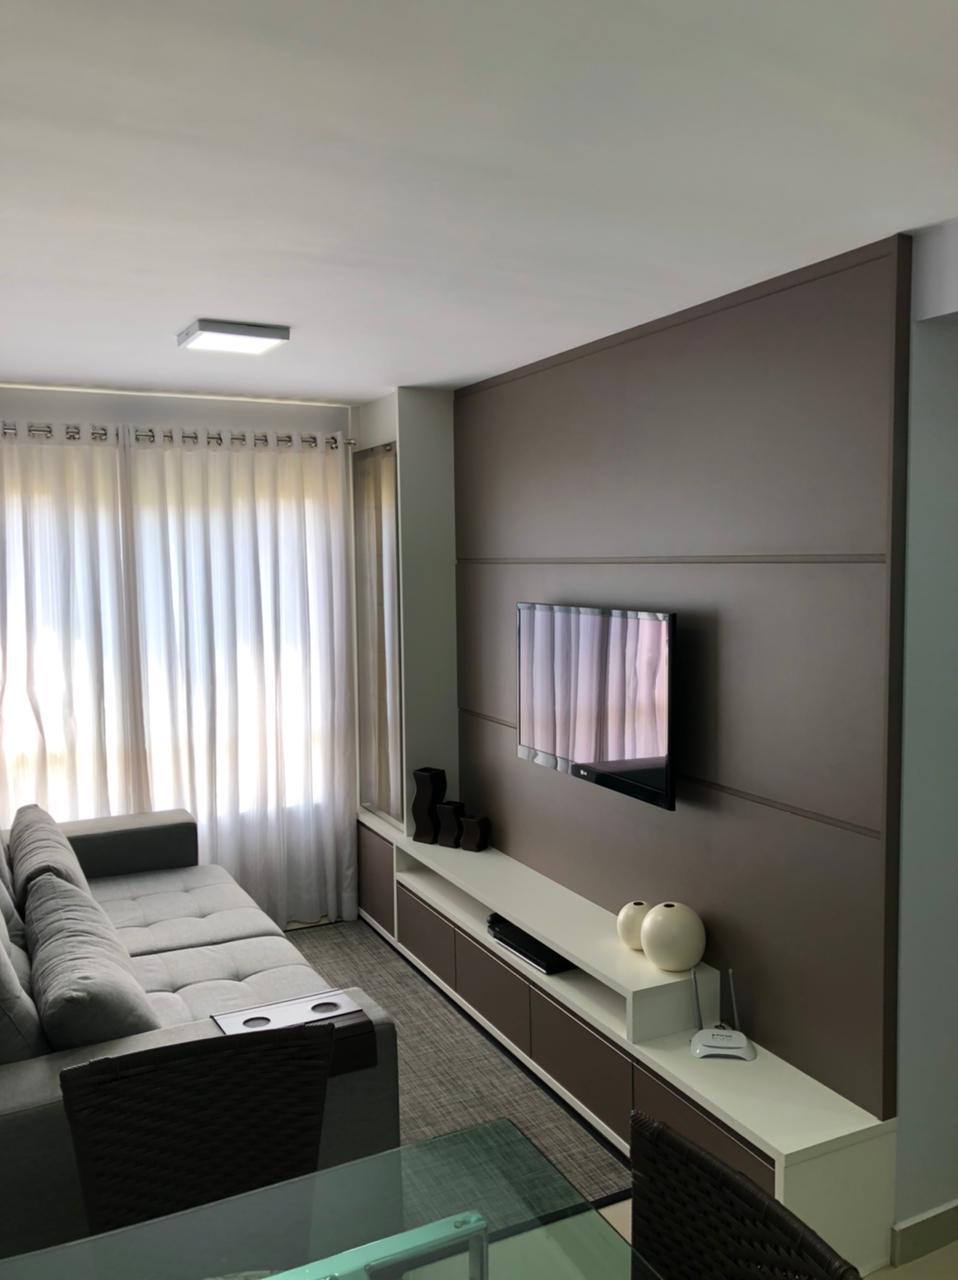 https://s3-sa-east-1.amazonaws.com/static-arbo/AP3153_GPRDO/apartamentoavendachacaramanellacambepr_1625009427908.jpeg